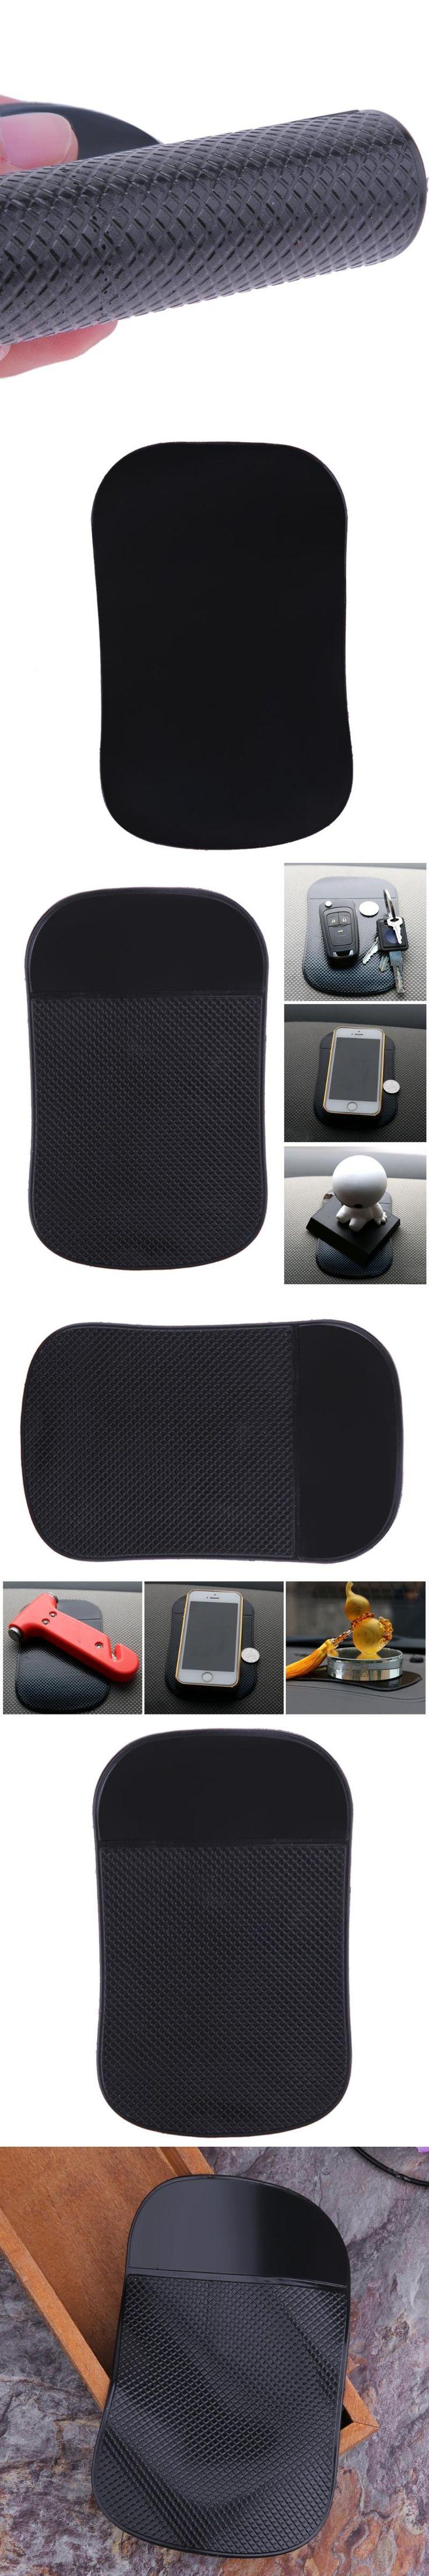 Car Interior Dashboard Mount Thick Anti Skid Mat Pad Sticker Black PU Non Slip Dash Mat Sticker for Phone Hot Sale